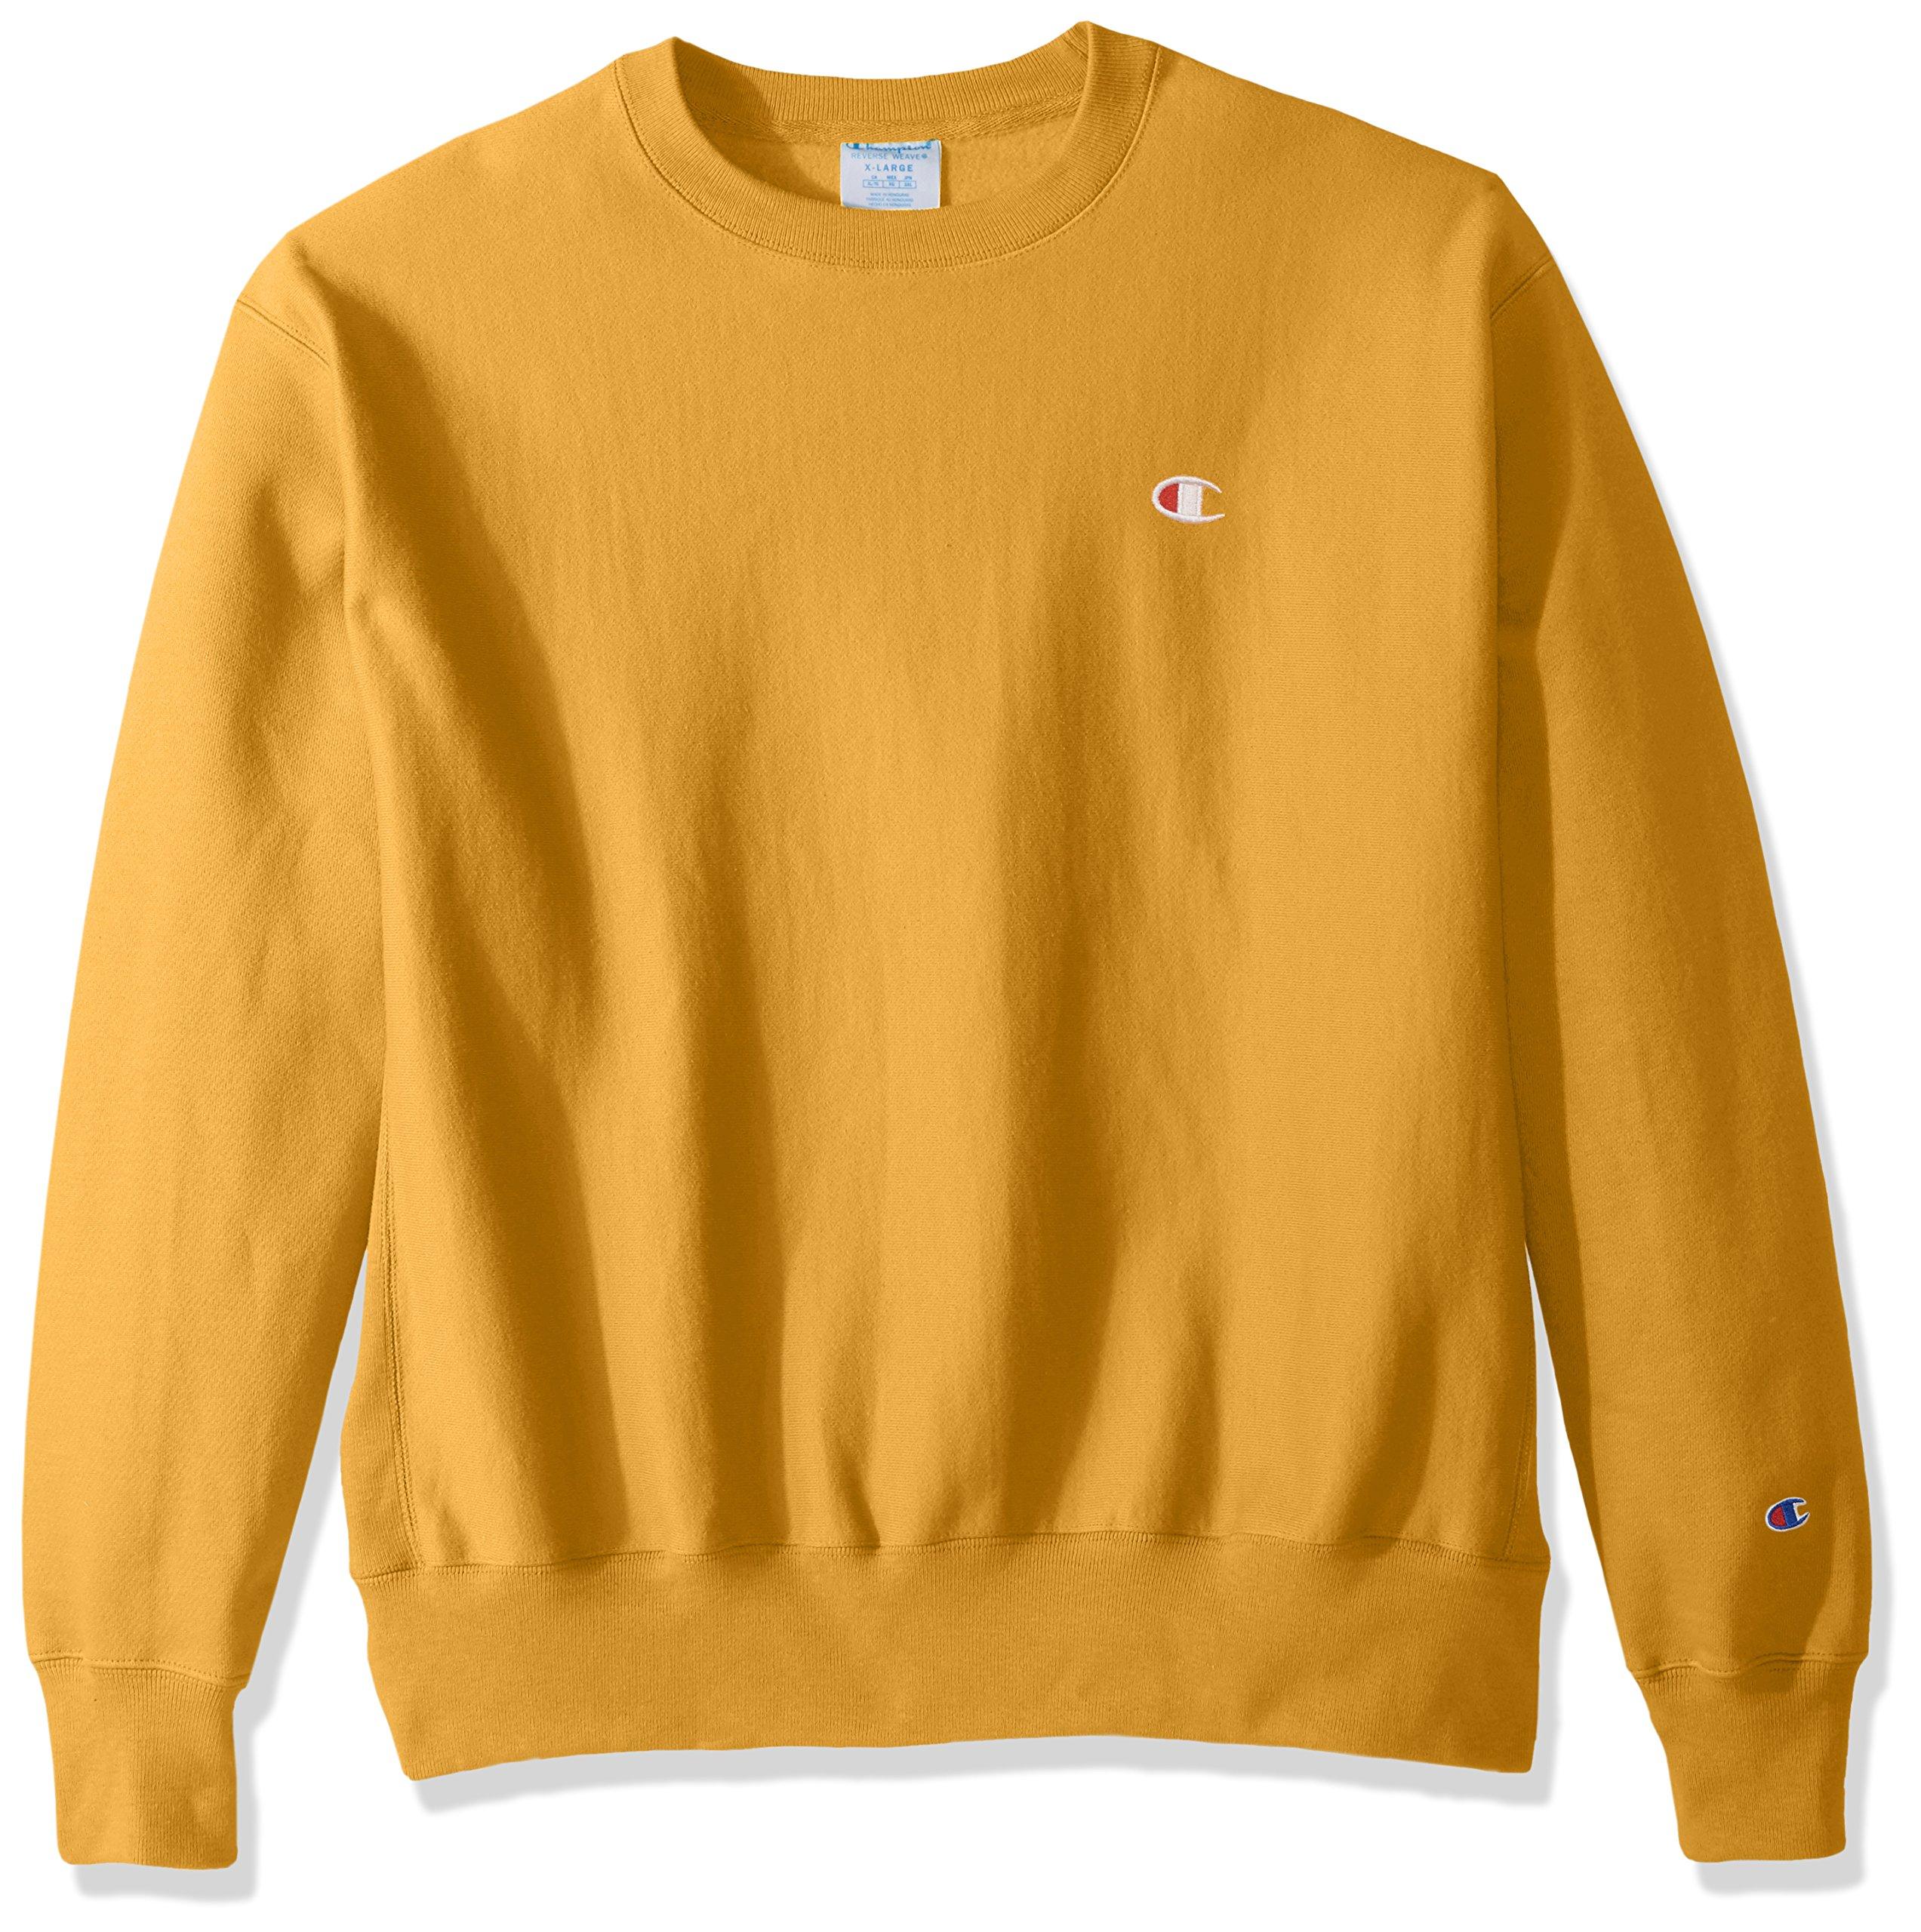 Champion LIFE Men's Reverse Weave Sweatshirt,C Gold/Left Chest ''C'' Logo,MEDIUM by Champion LIFE